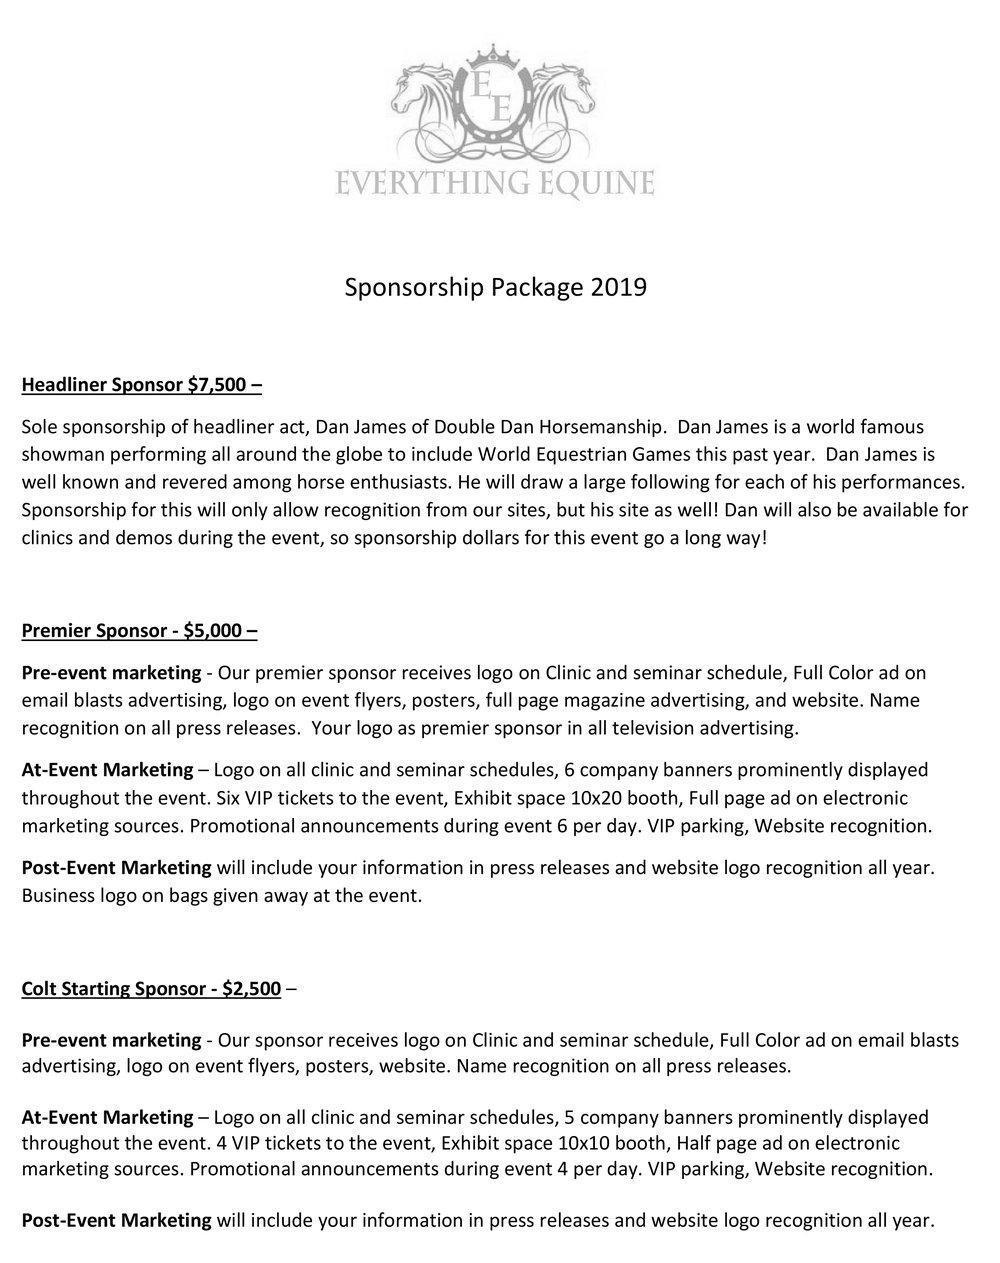 everything equine Sponsorship Package 2019-1.jpg